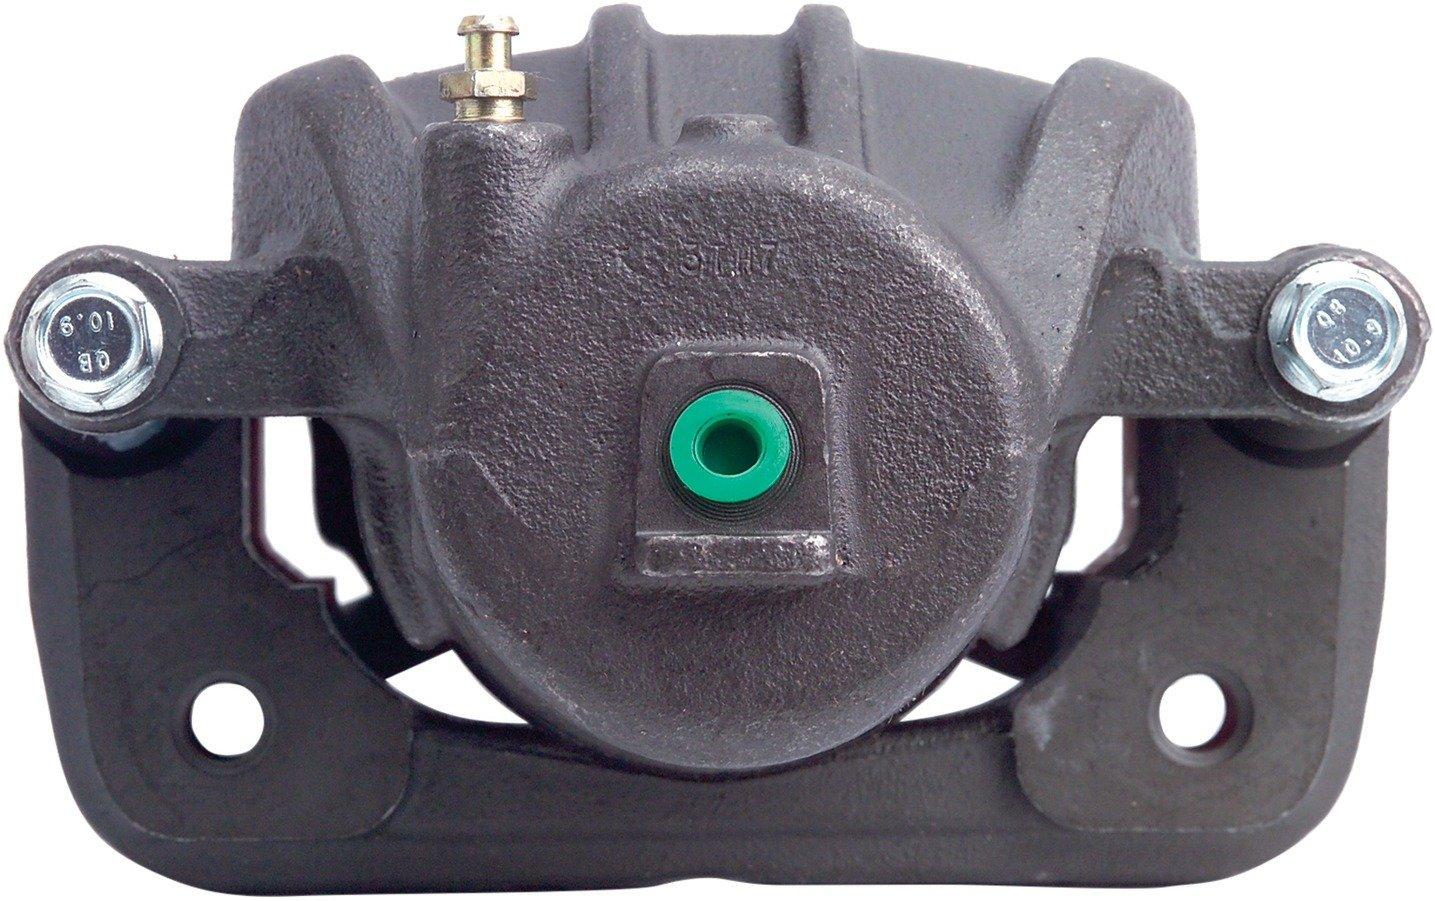 Brake Caliper A1 Cardone Unloaded Cardone 18-B4382 Remanufactured Domestic Friction Ready